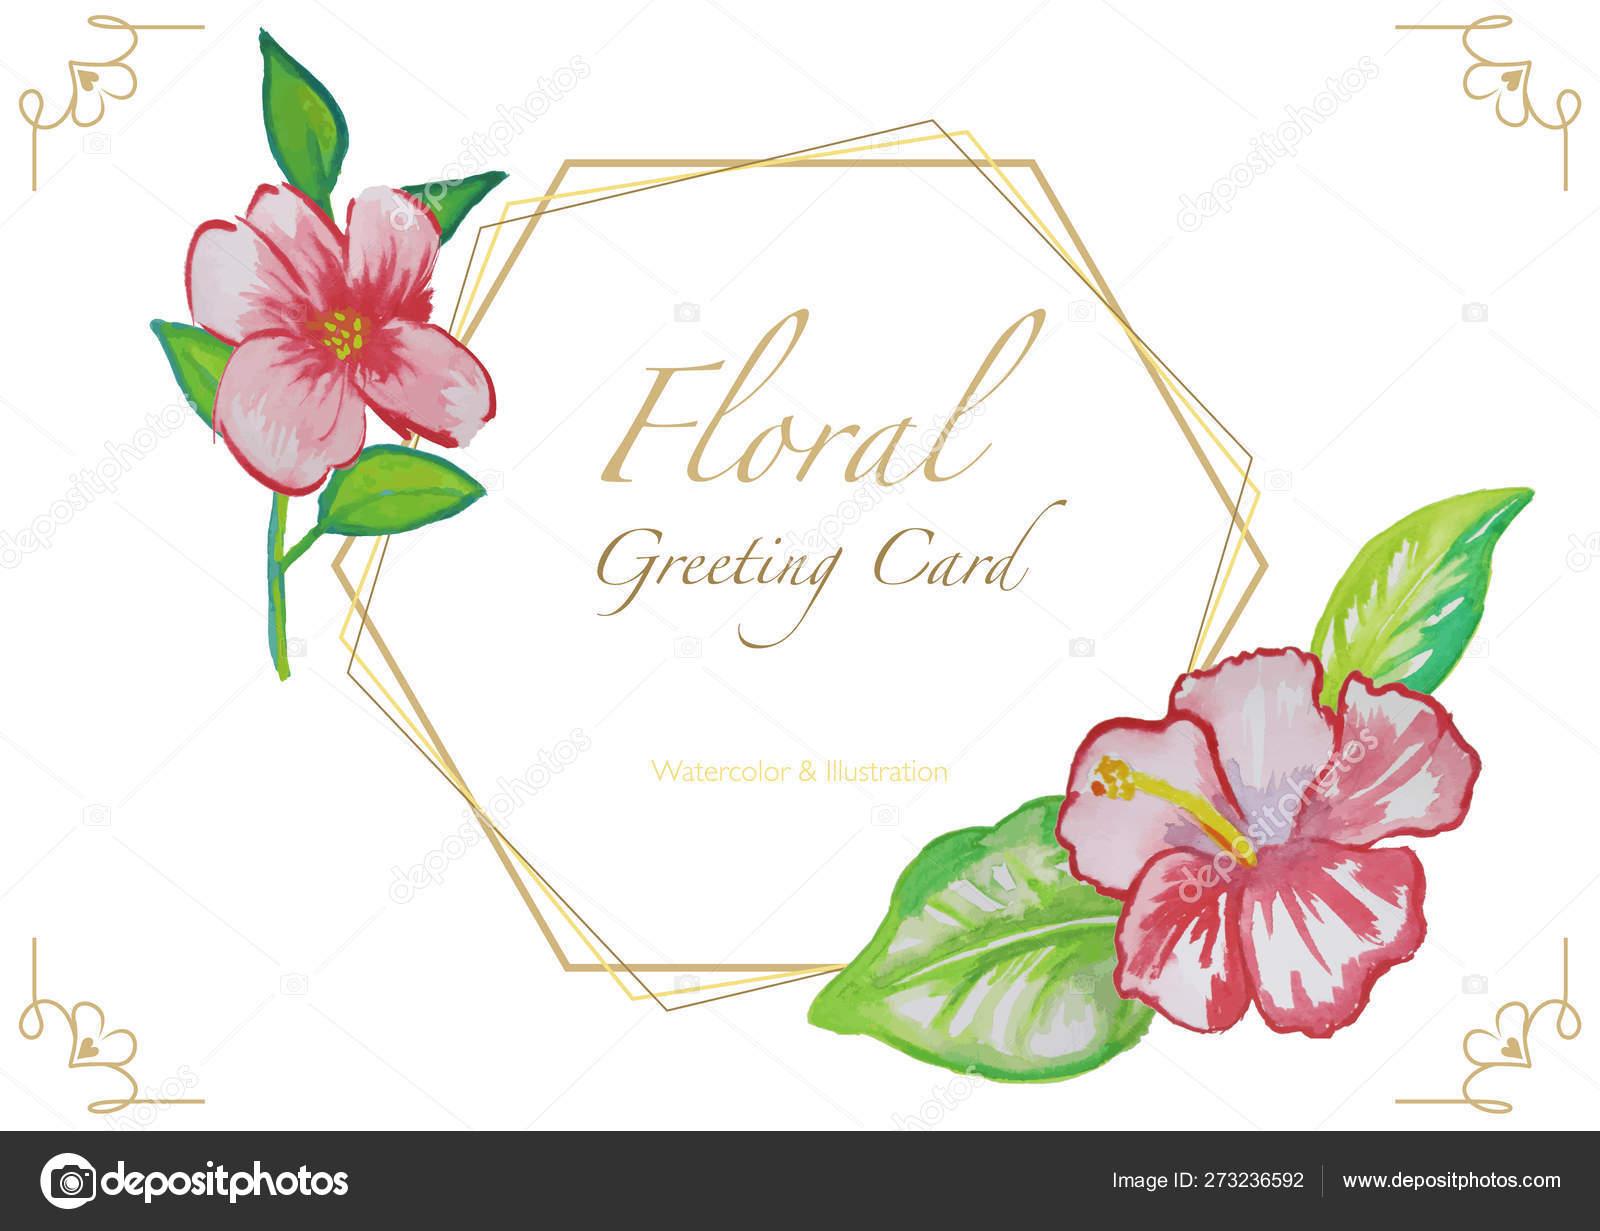 floral watercolor greeting card golden frame corner decoration source illustration stock vector c dero2010 273236592 floral watercolor greeting card golden frame corner decoration source illustration stock vector c dero2010 273236592